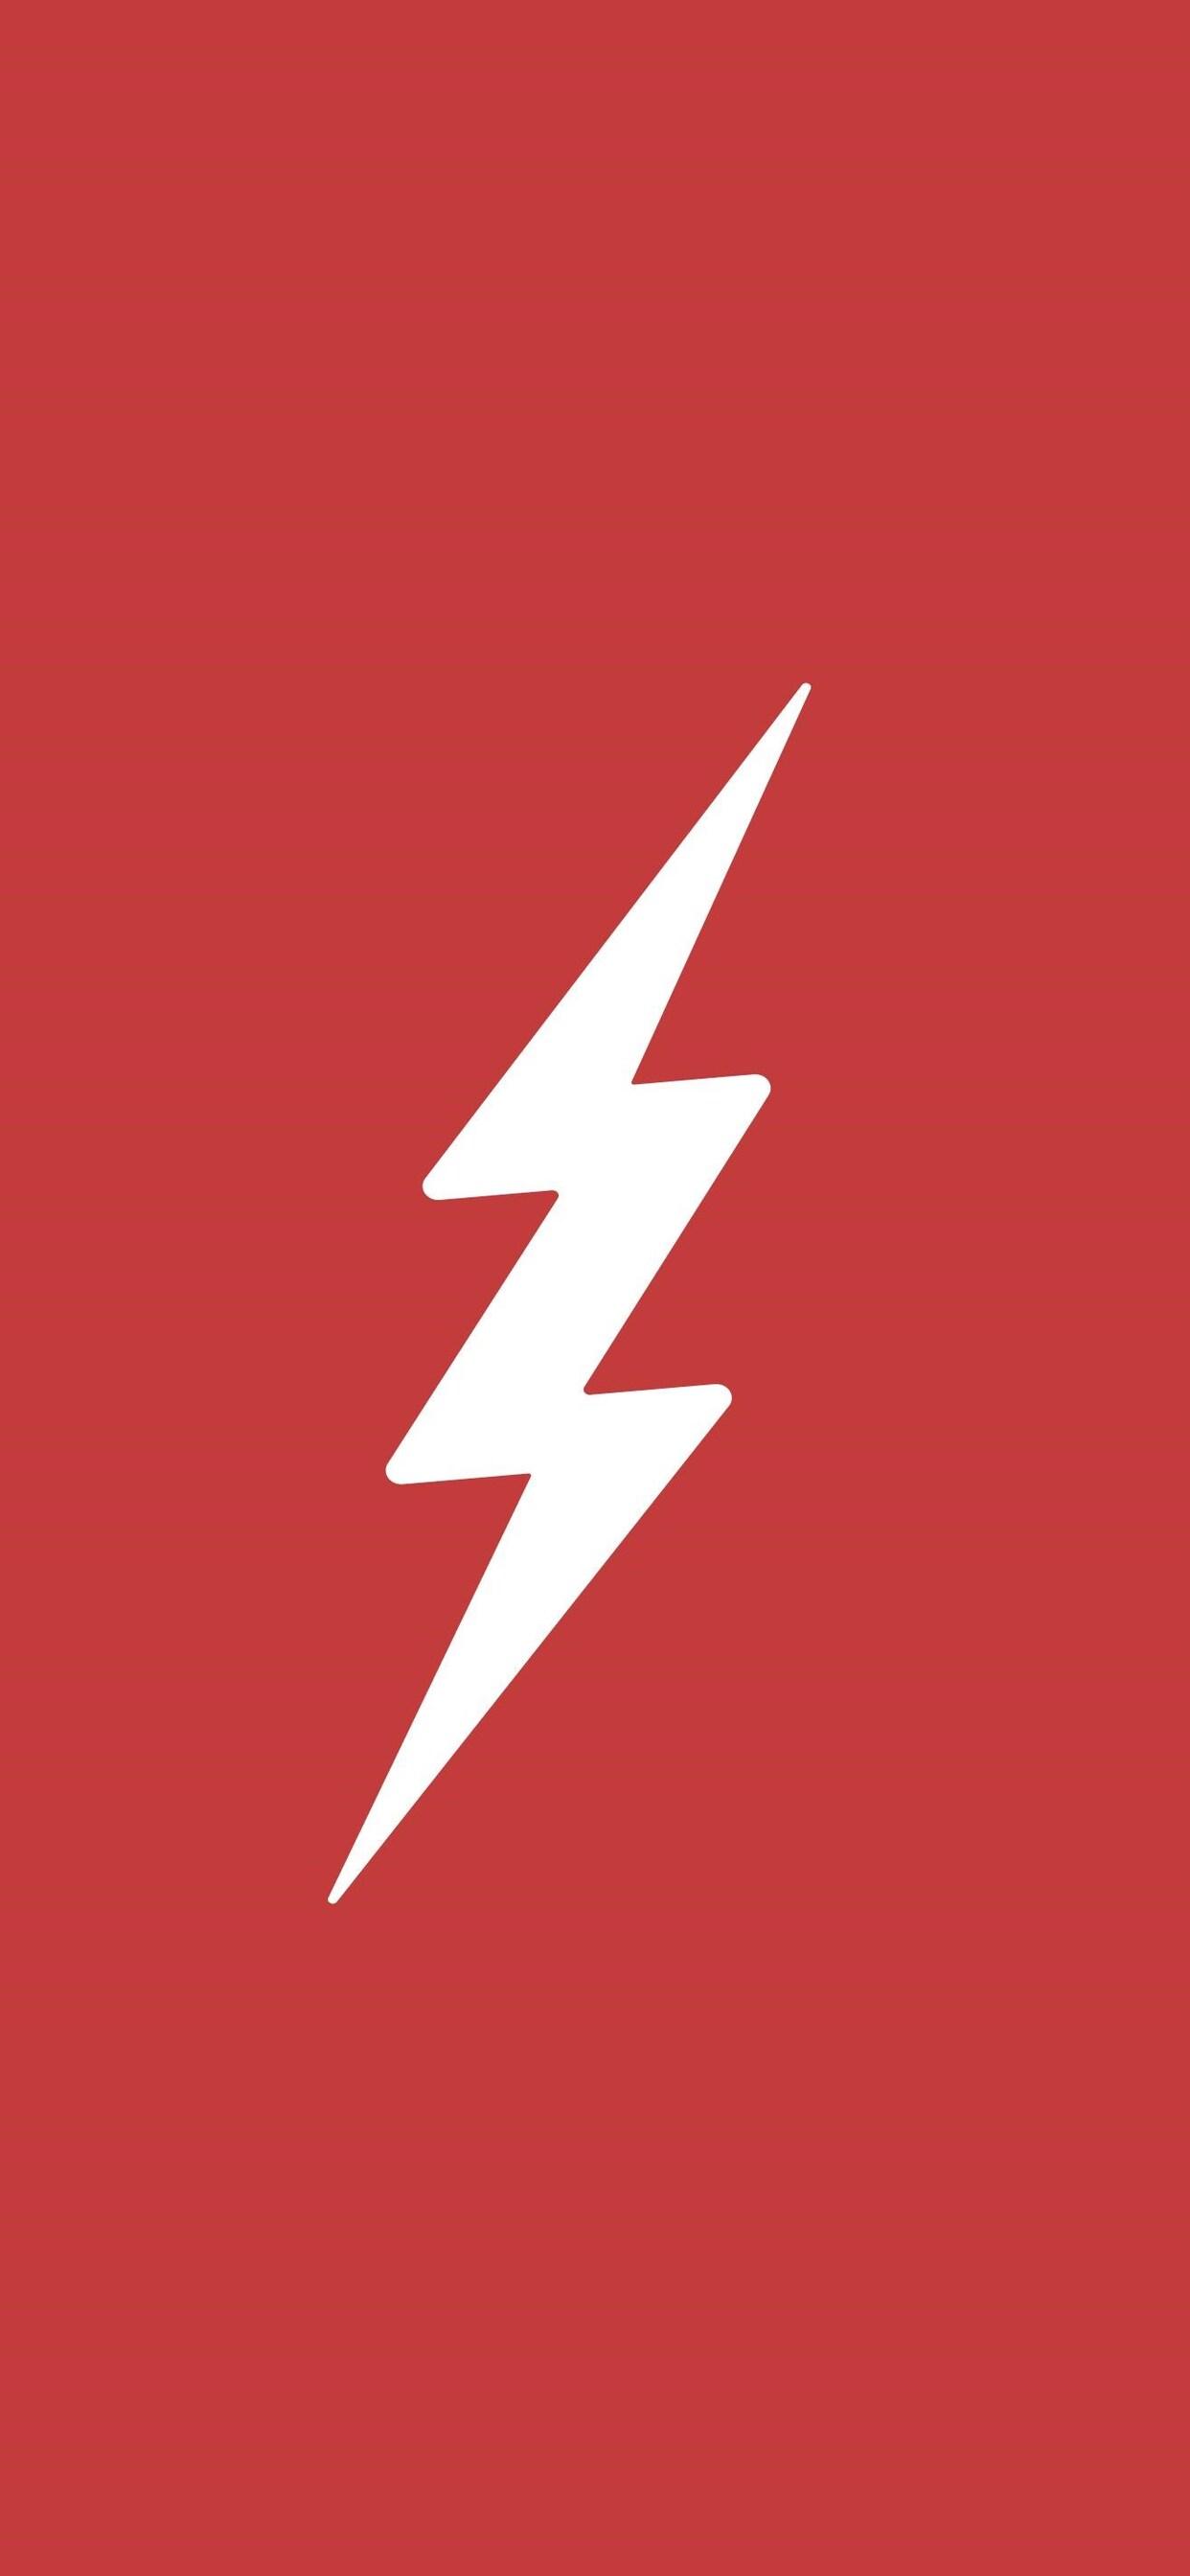 flash-logo-minimalism-ad.jpg